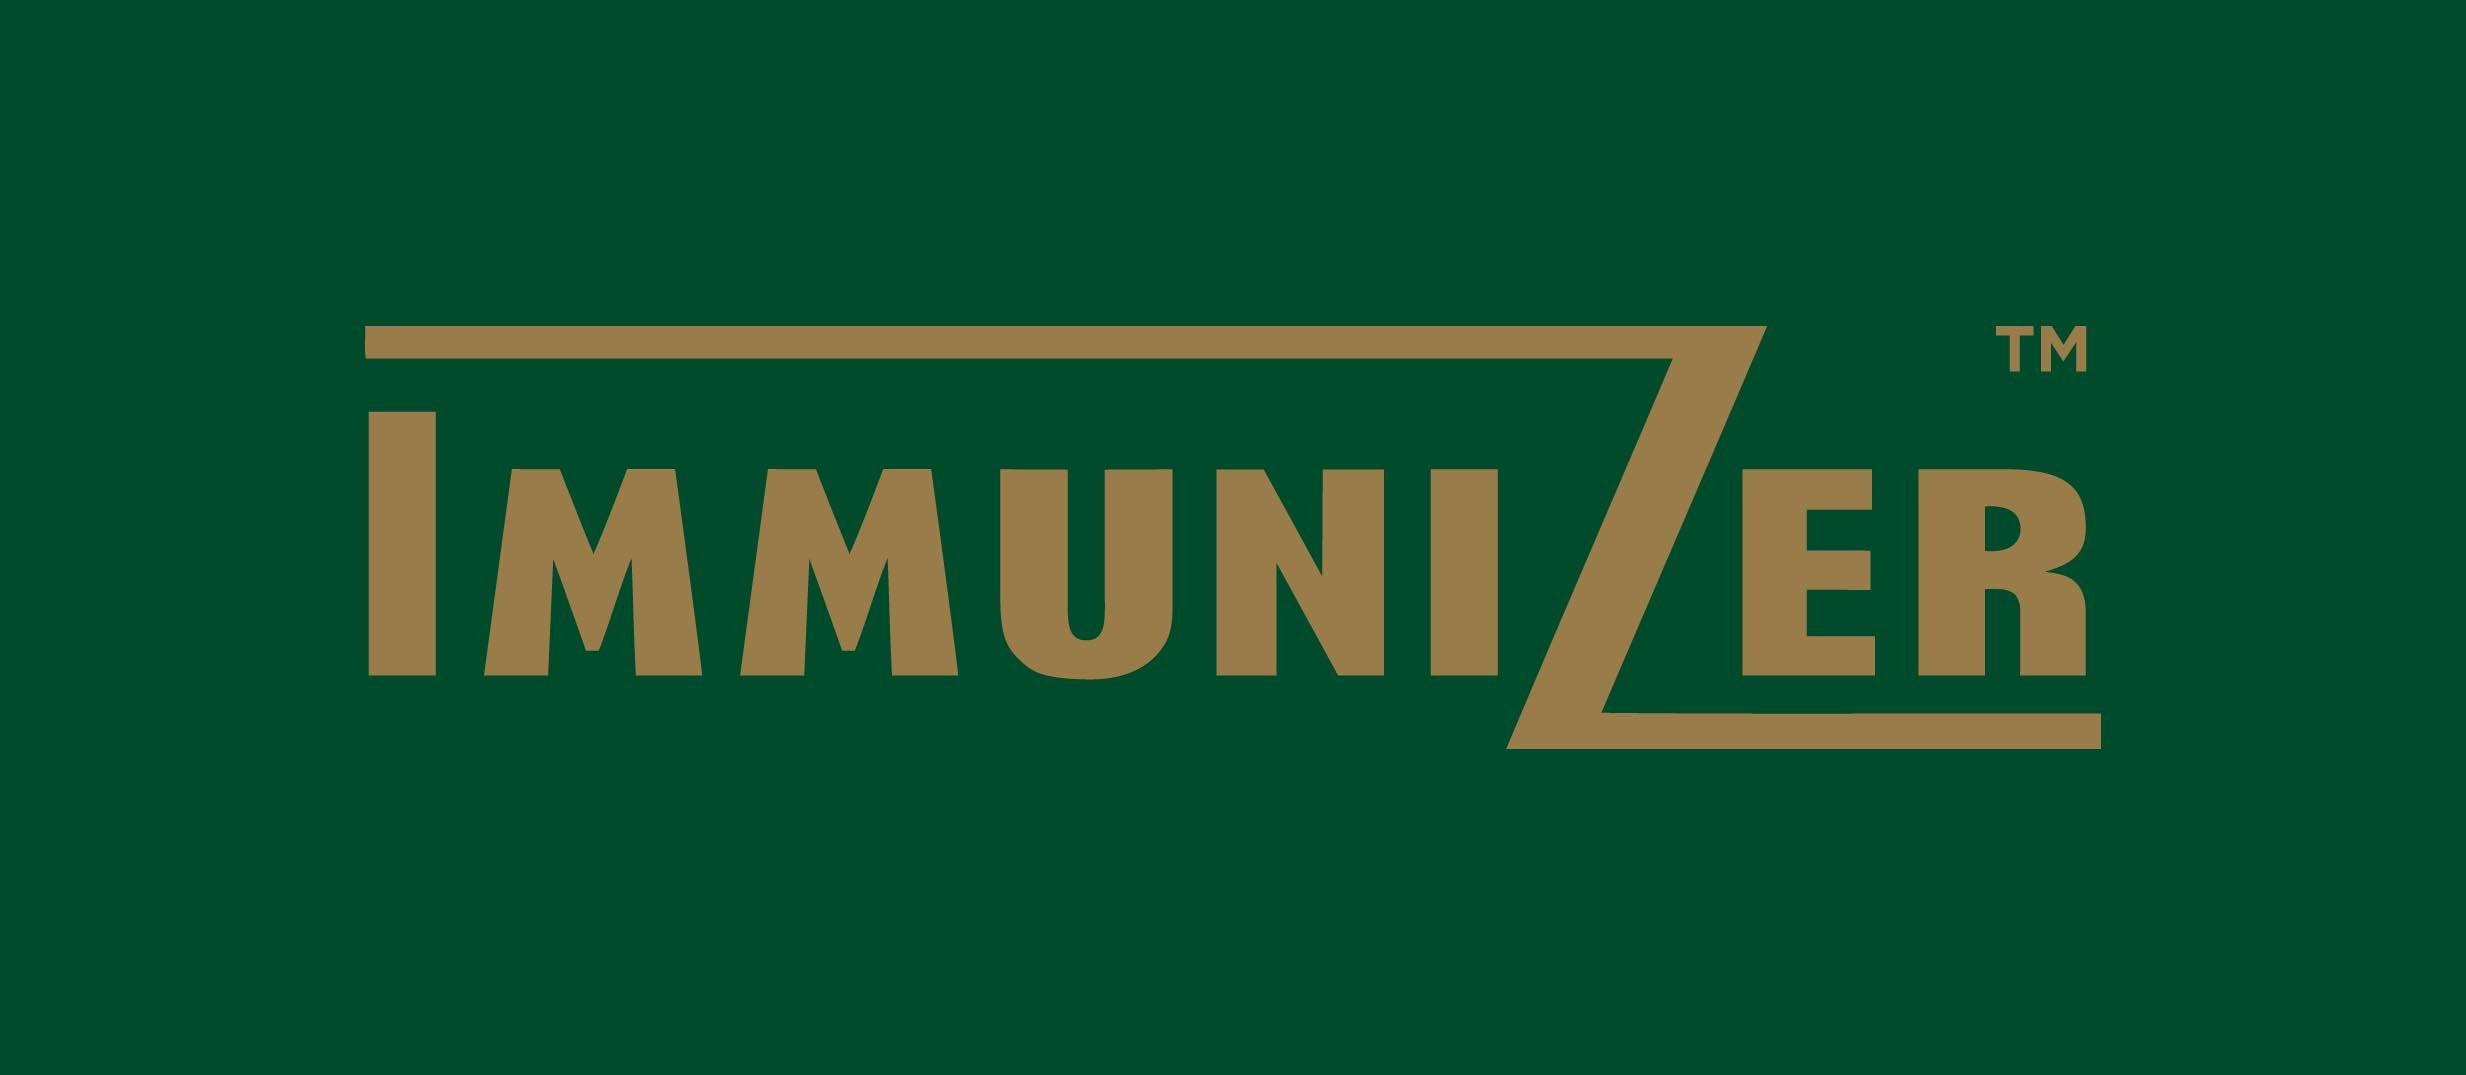 immunizer sponsor image